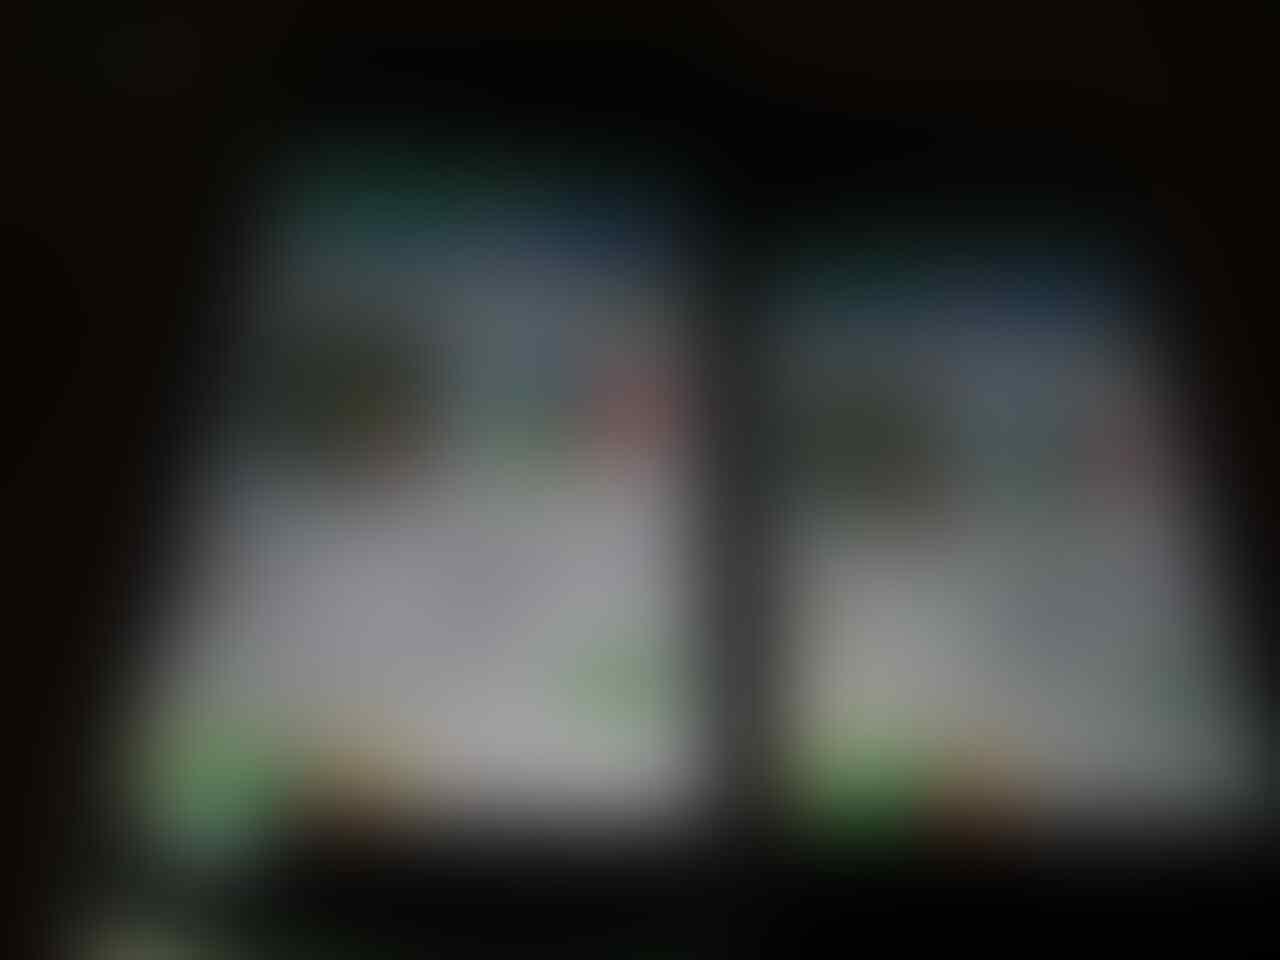 [Waiting Lounge] OnePlus One - #neversettle